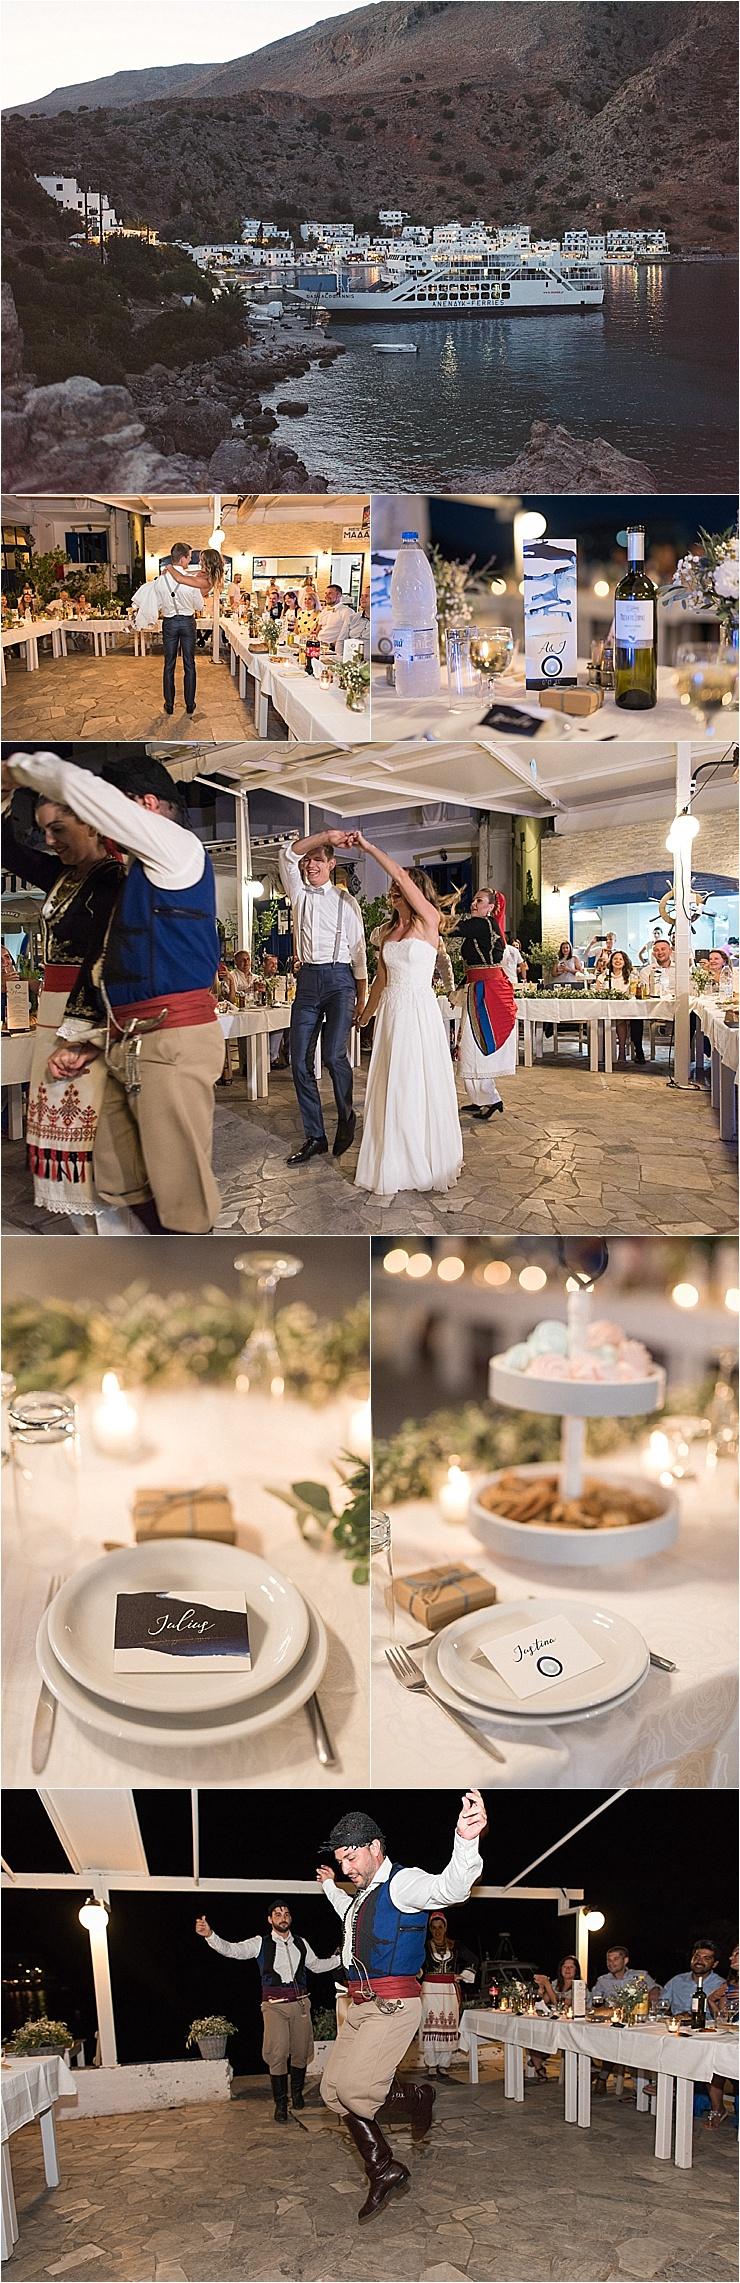 A Cretan themed wedding reception in Crete by Andreas Markakis Photography